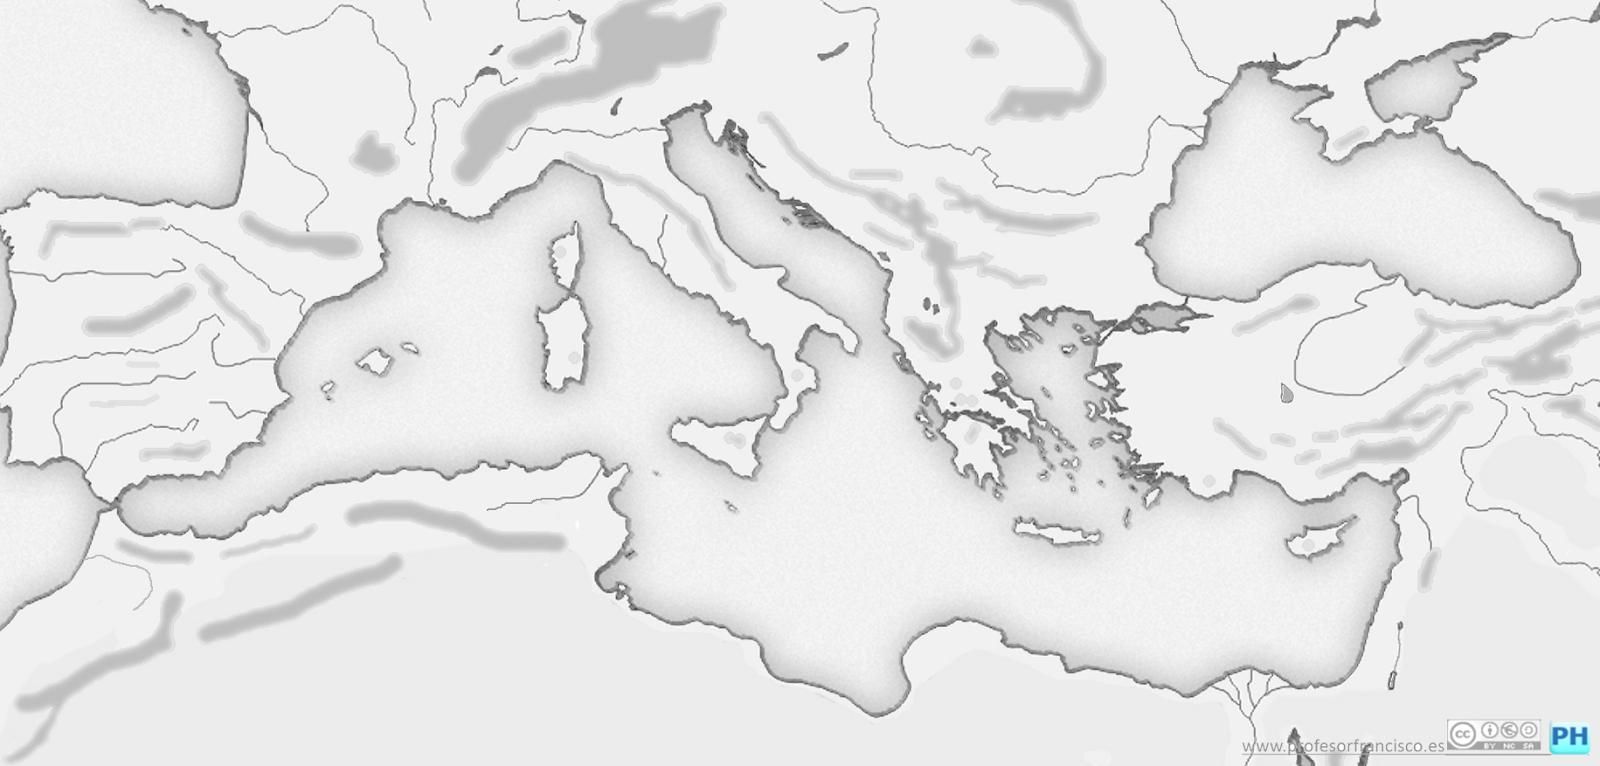 Mapa Imperio Romano Mudo.Profesor De Historia Geografia Y Arte Mapas Mudos De La